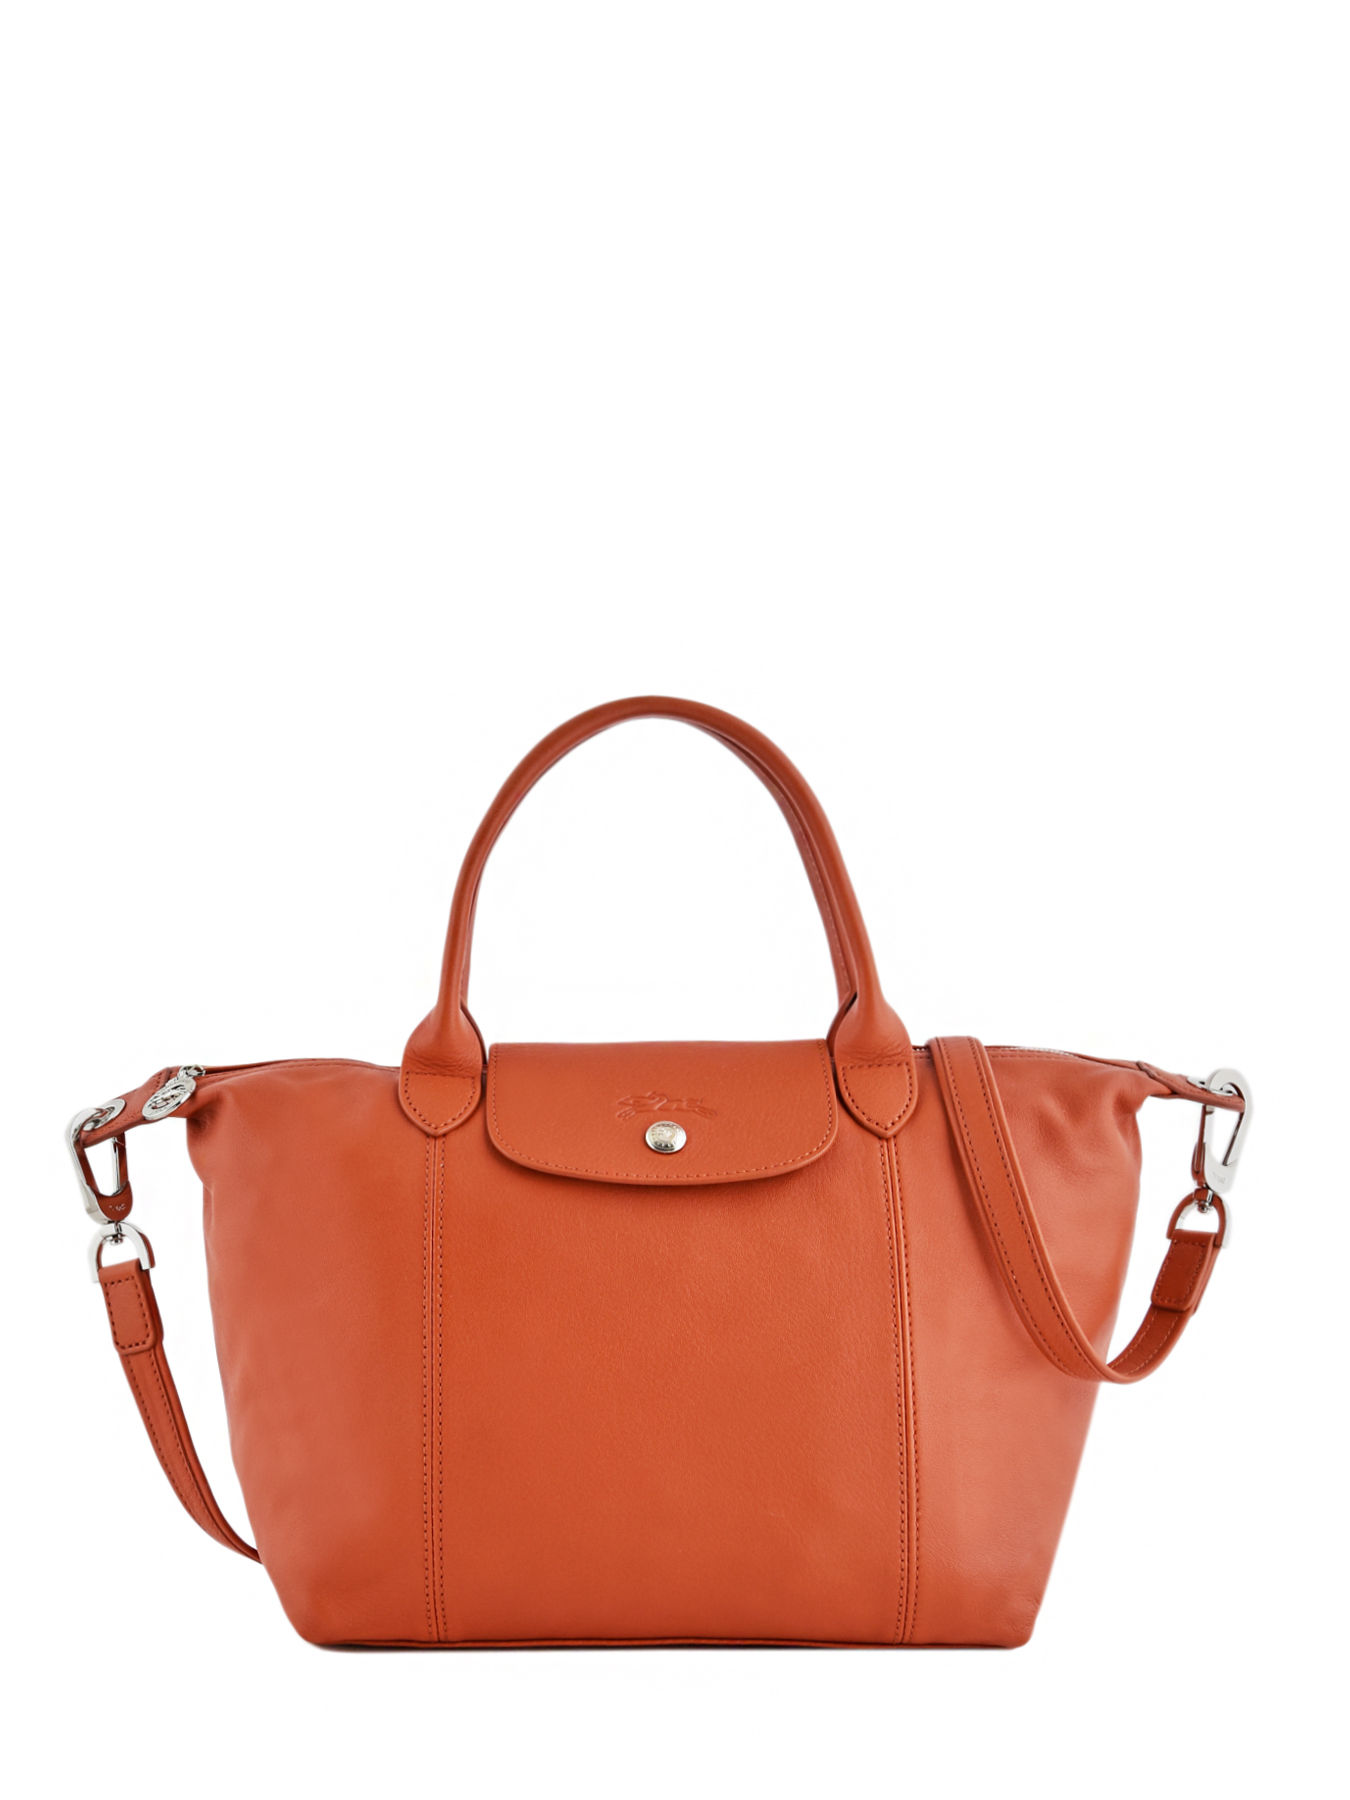 dd2fdc568b08 Longchamp Handbag Orange · Longchamp Handbag Orange ...